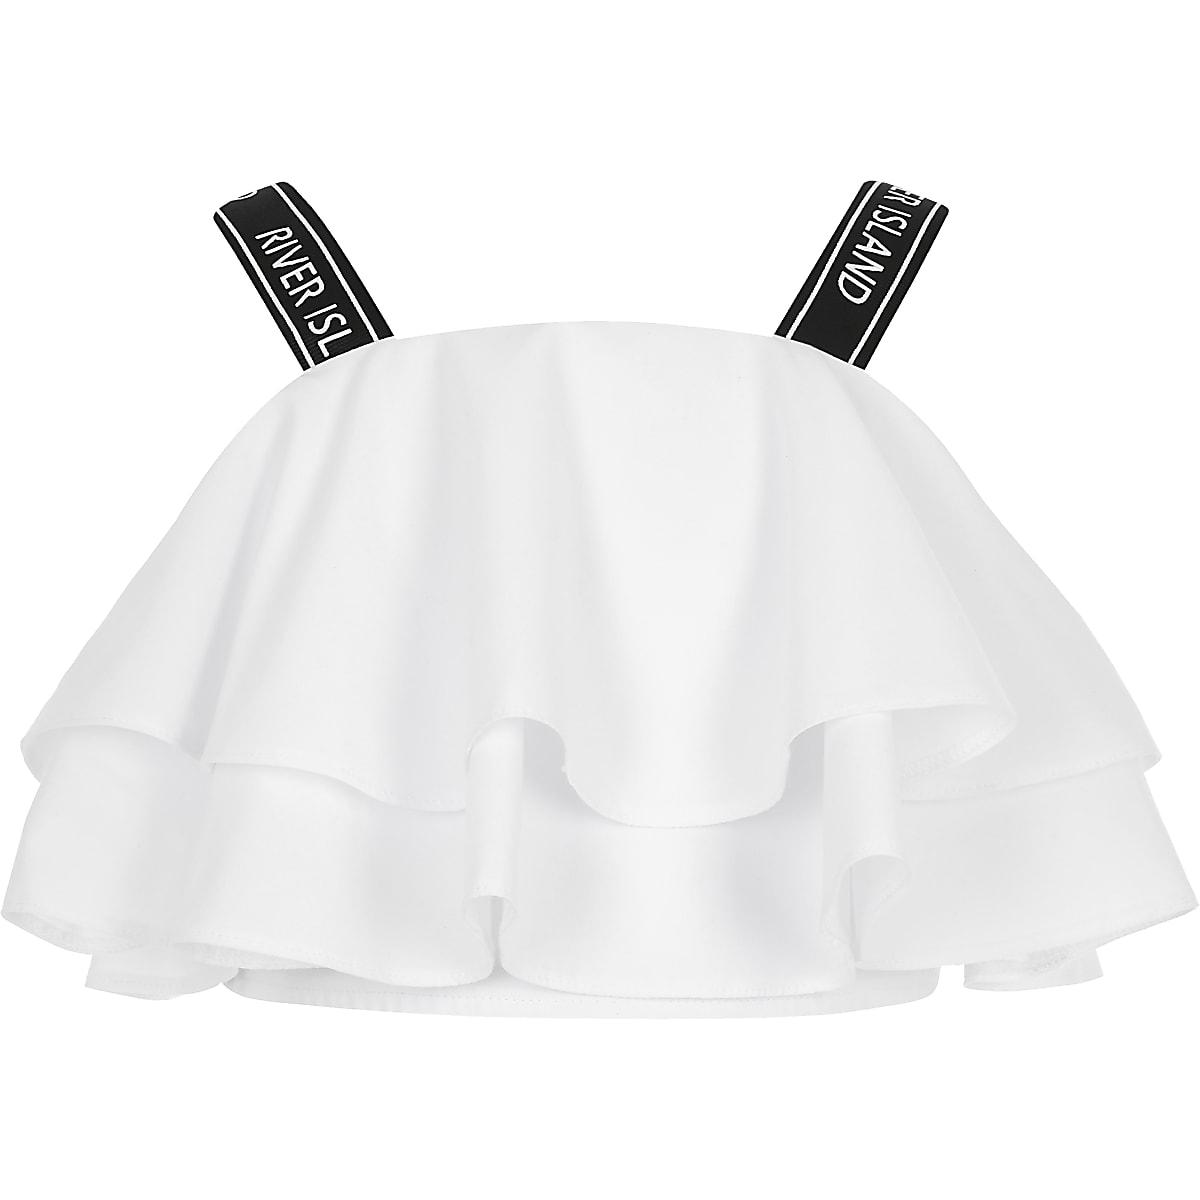 Girls white RI strap frill crop top